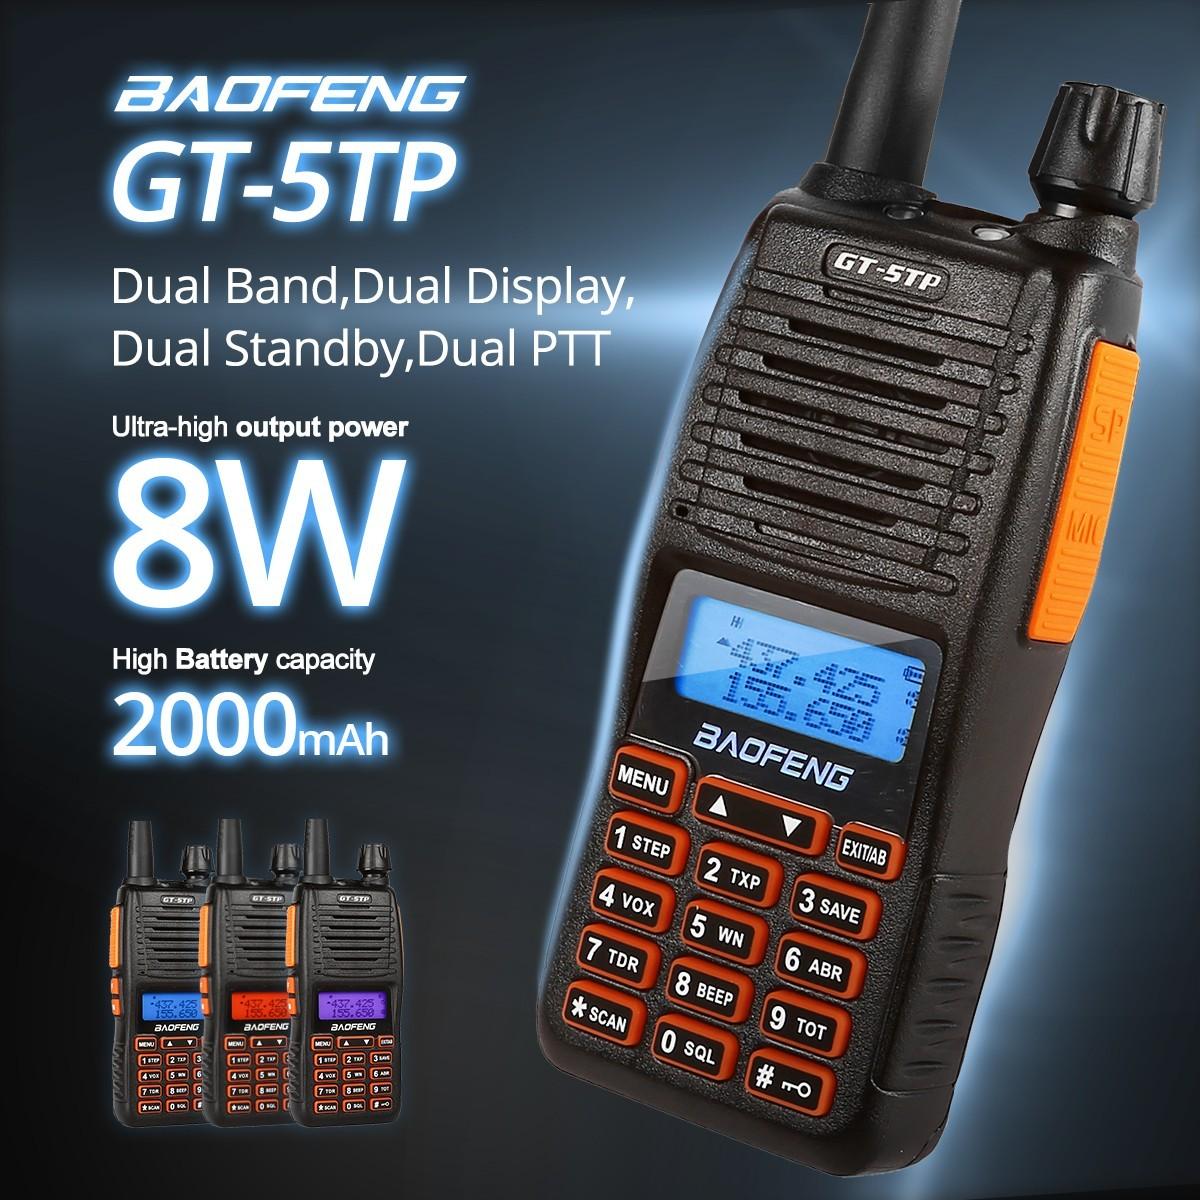 BaoFeng GT-5TP Dual Band  Two-Way Radio Walkie Talkie